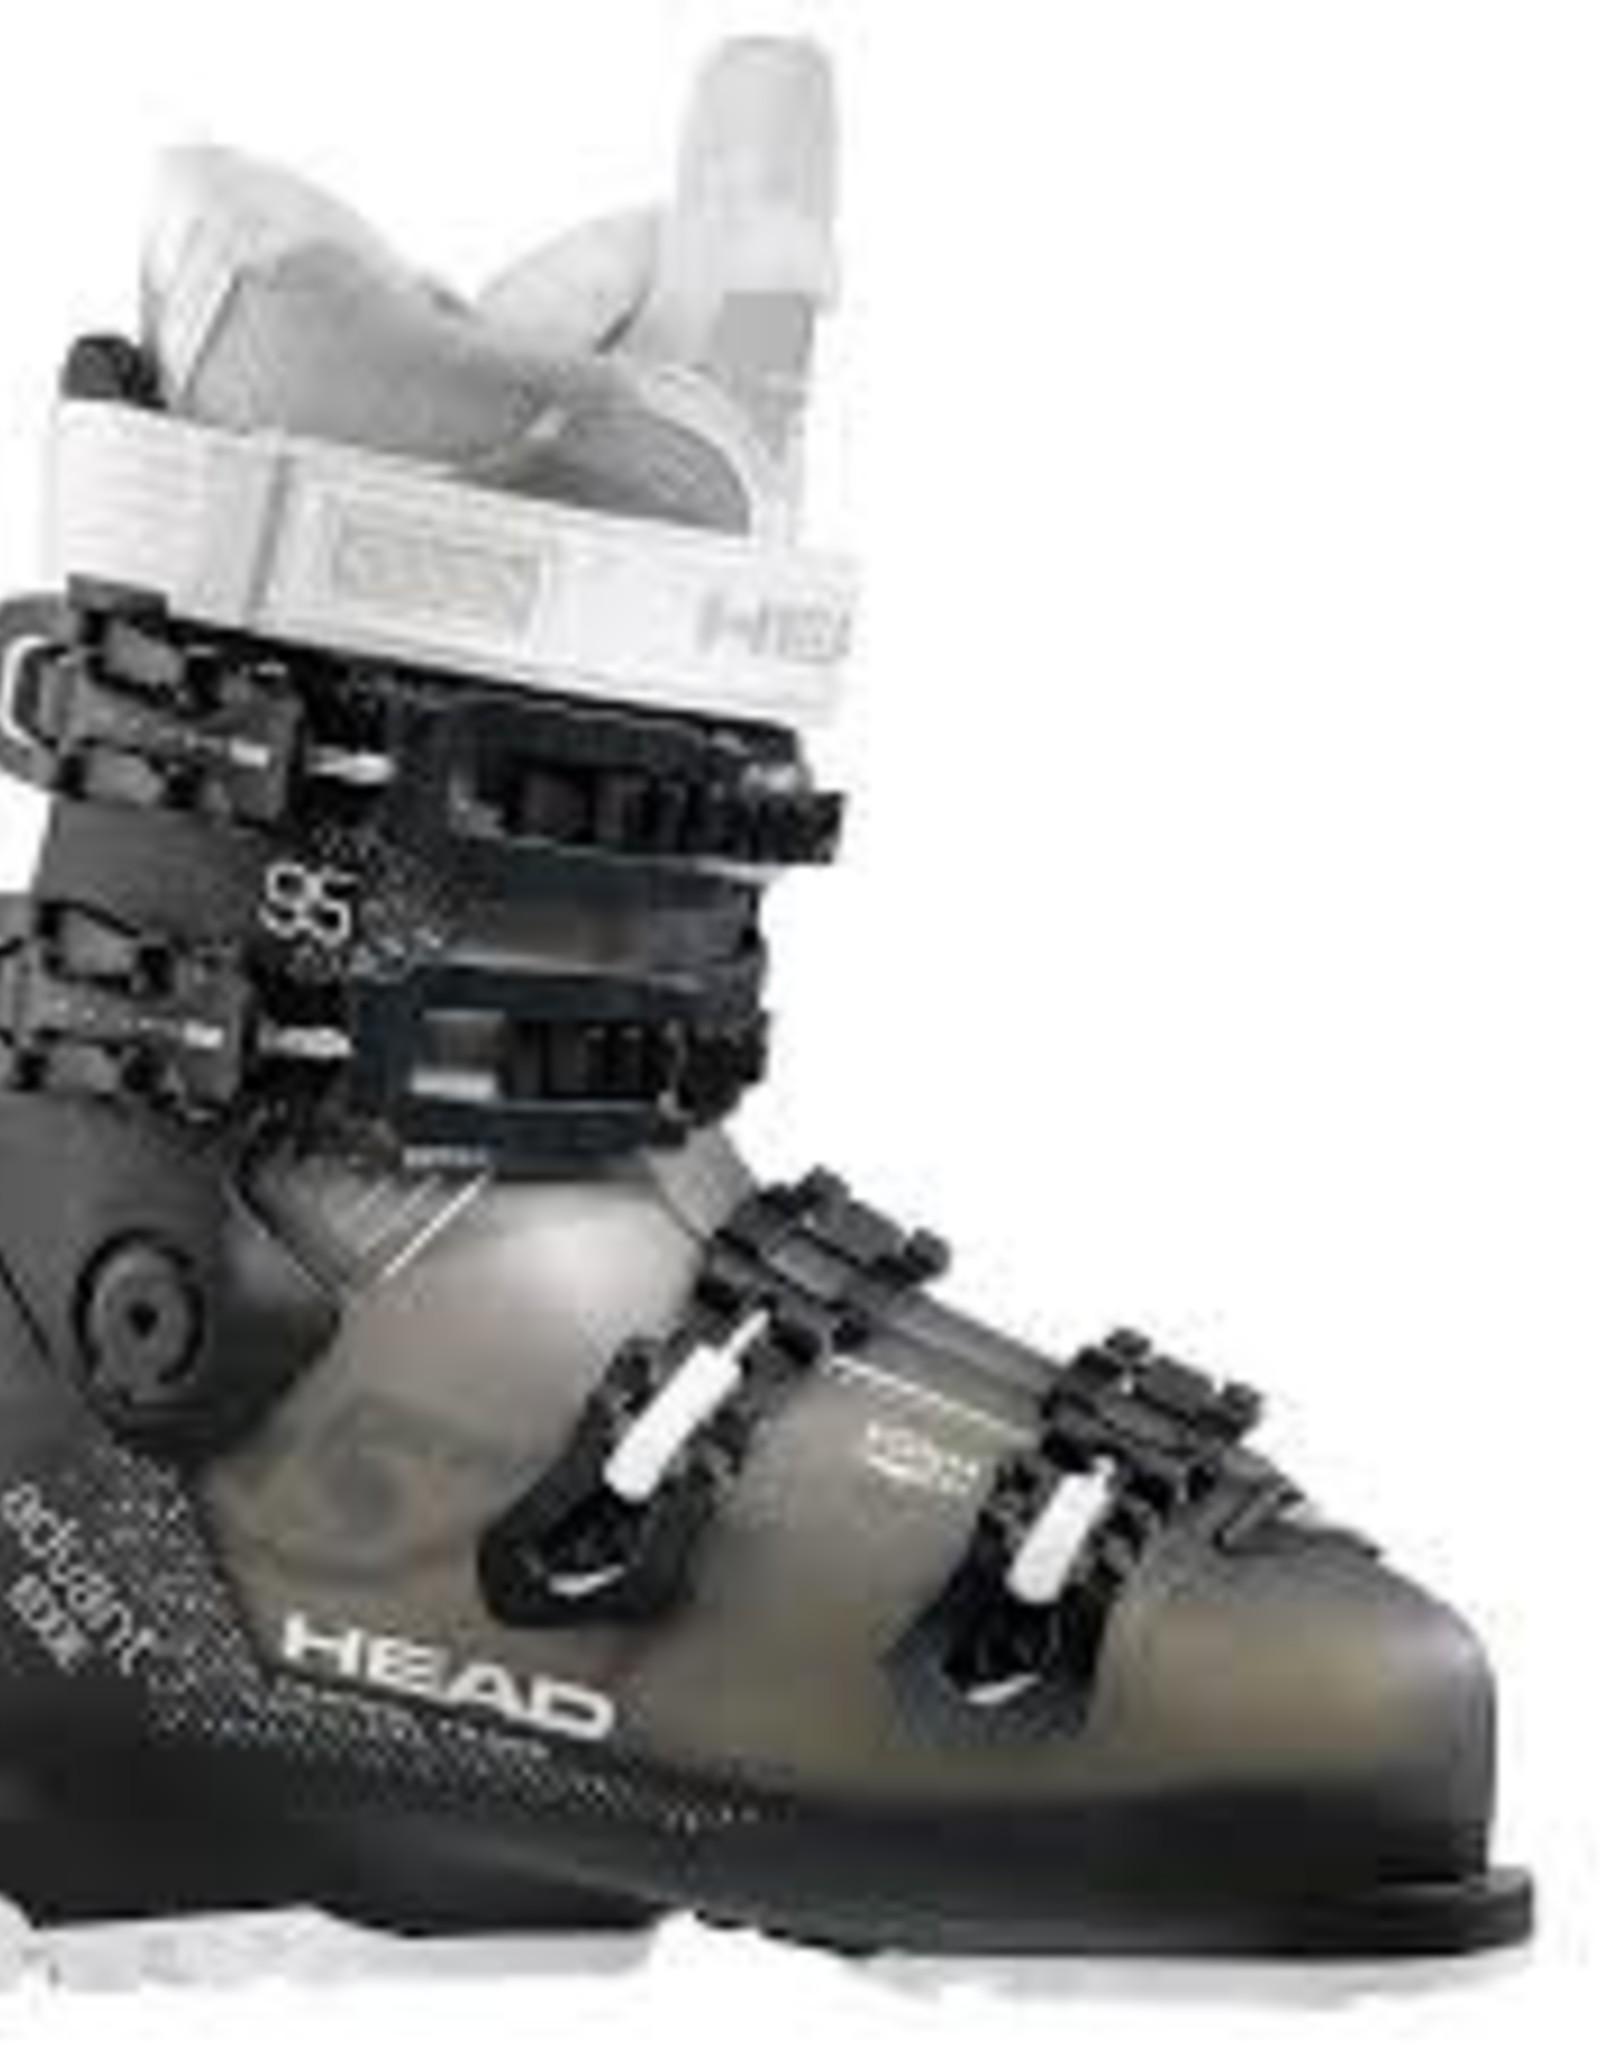 HEAD HEAD Ski Boots ADVANT EDGE 95 W (18/19)